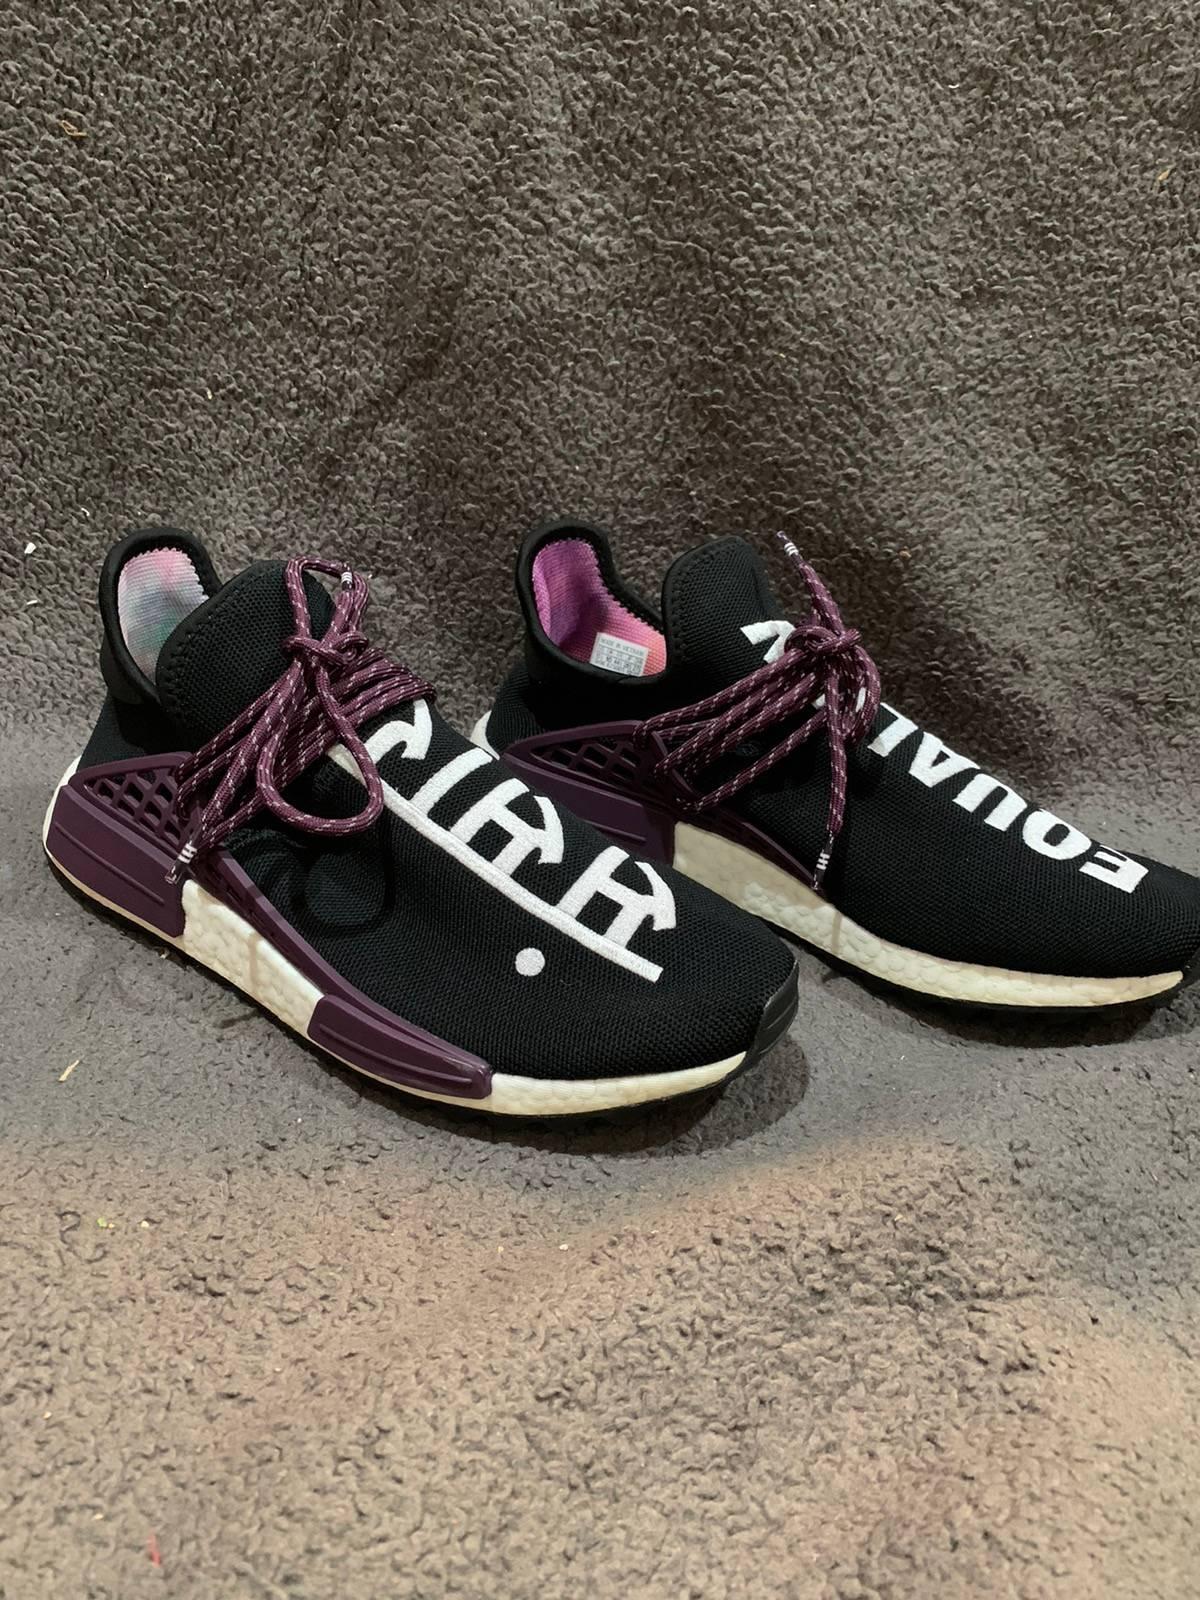 Adidas Pharrell X Nmd Human Race Trail Equality 2018 Size 10.5 $333